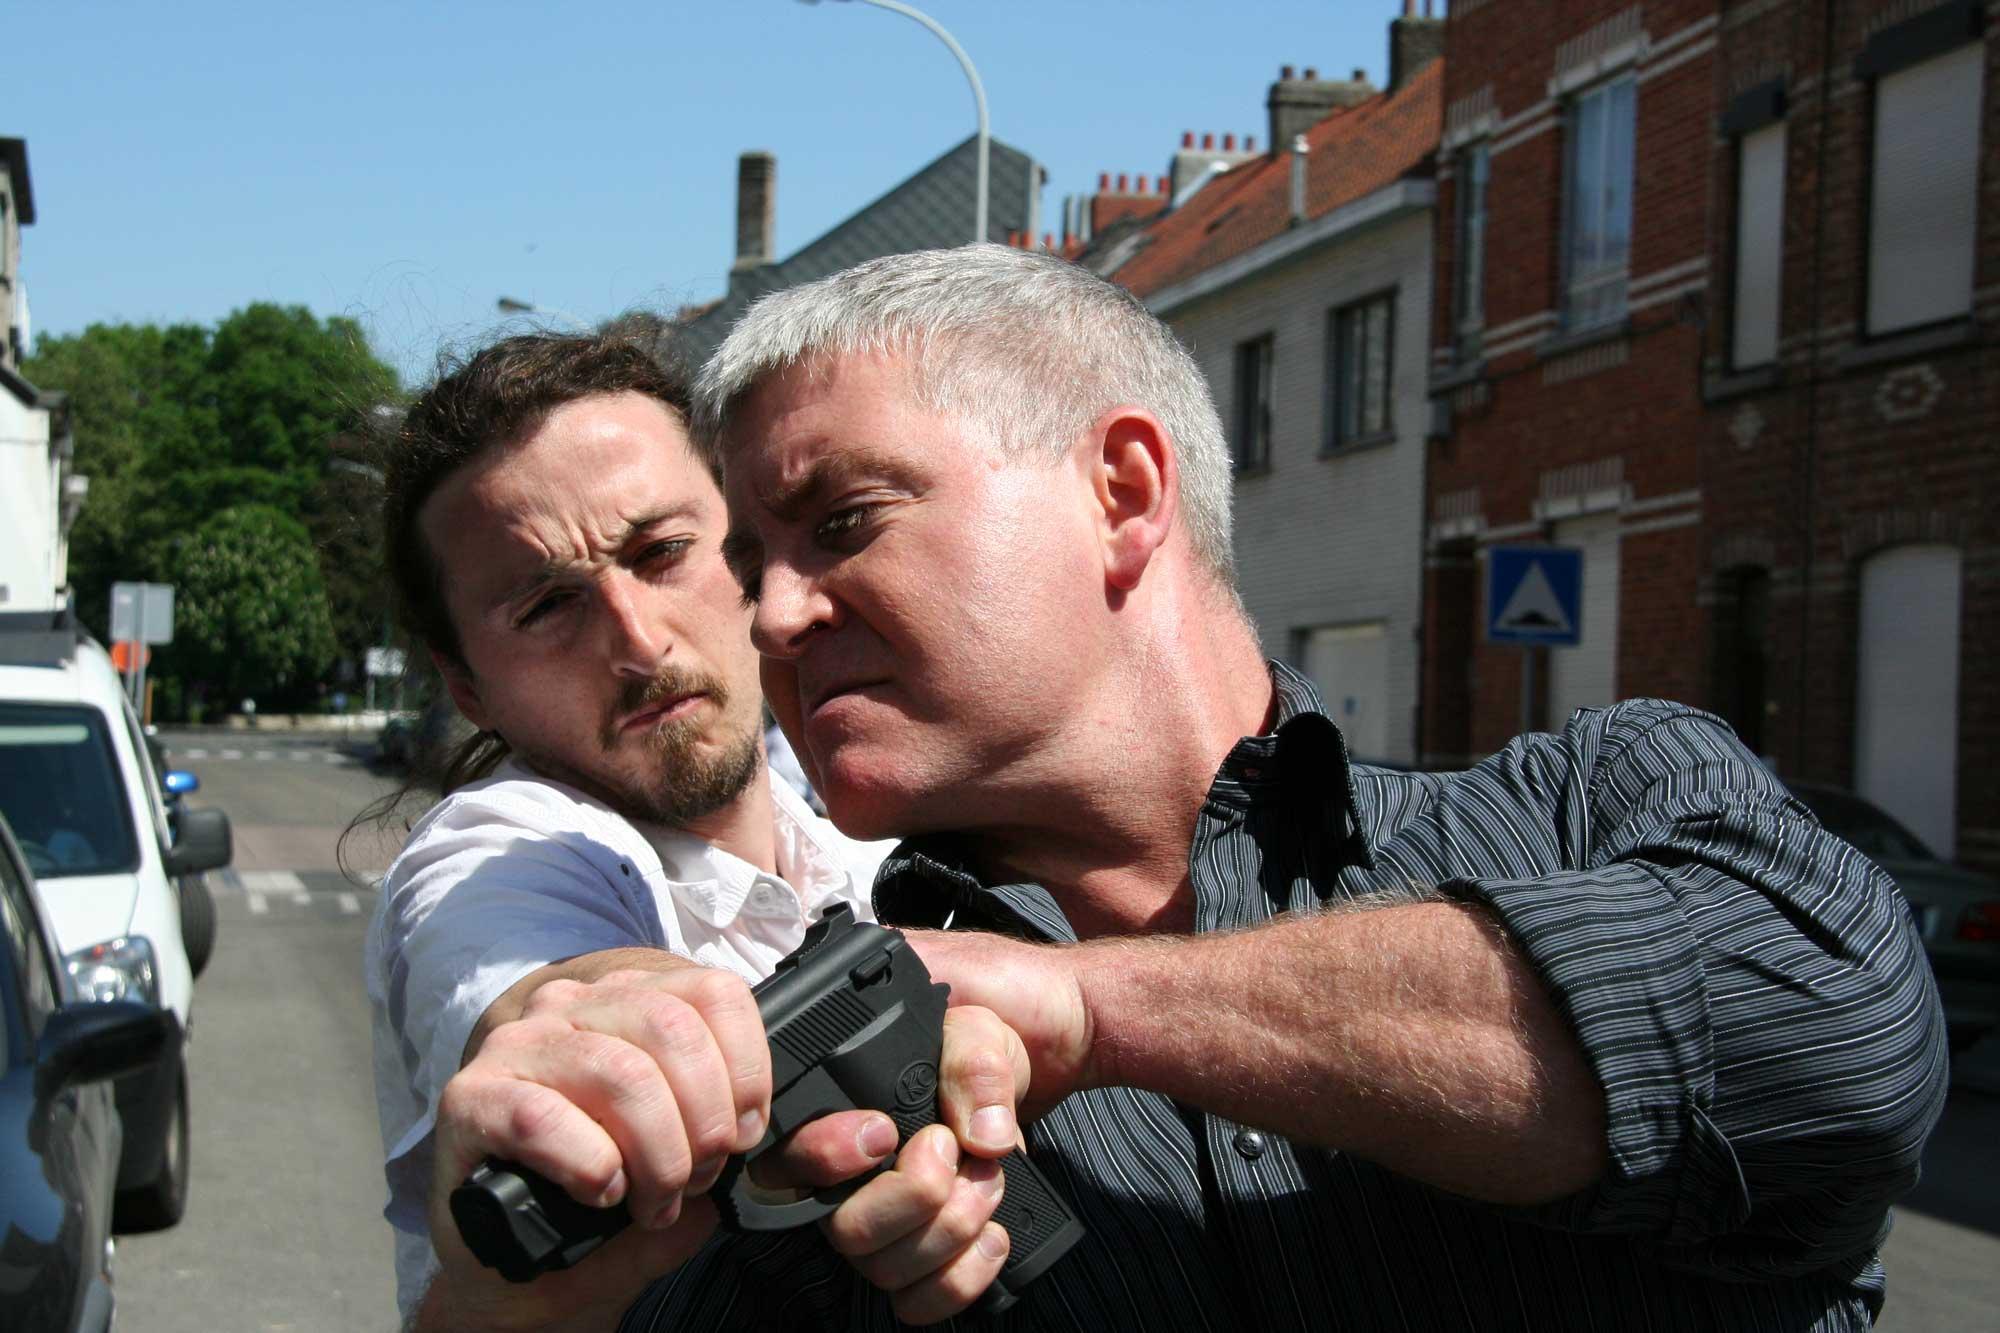 Serge and Bruno pistol disarm